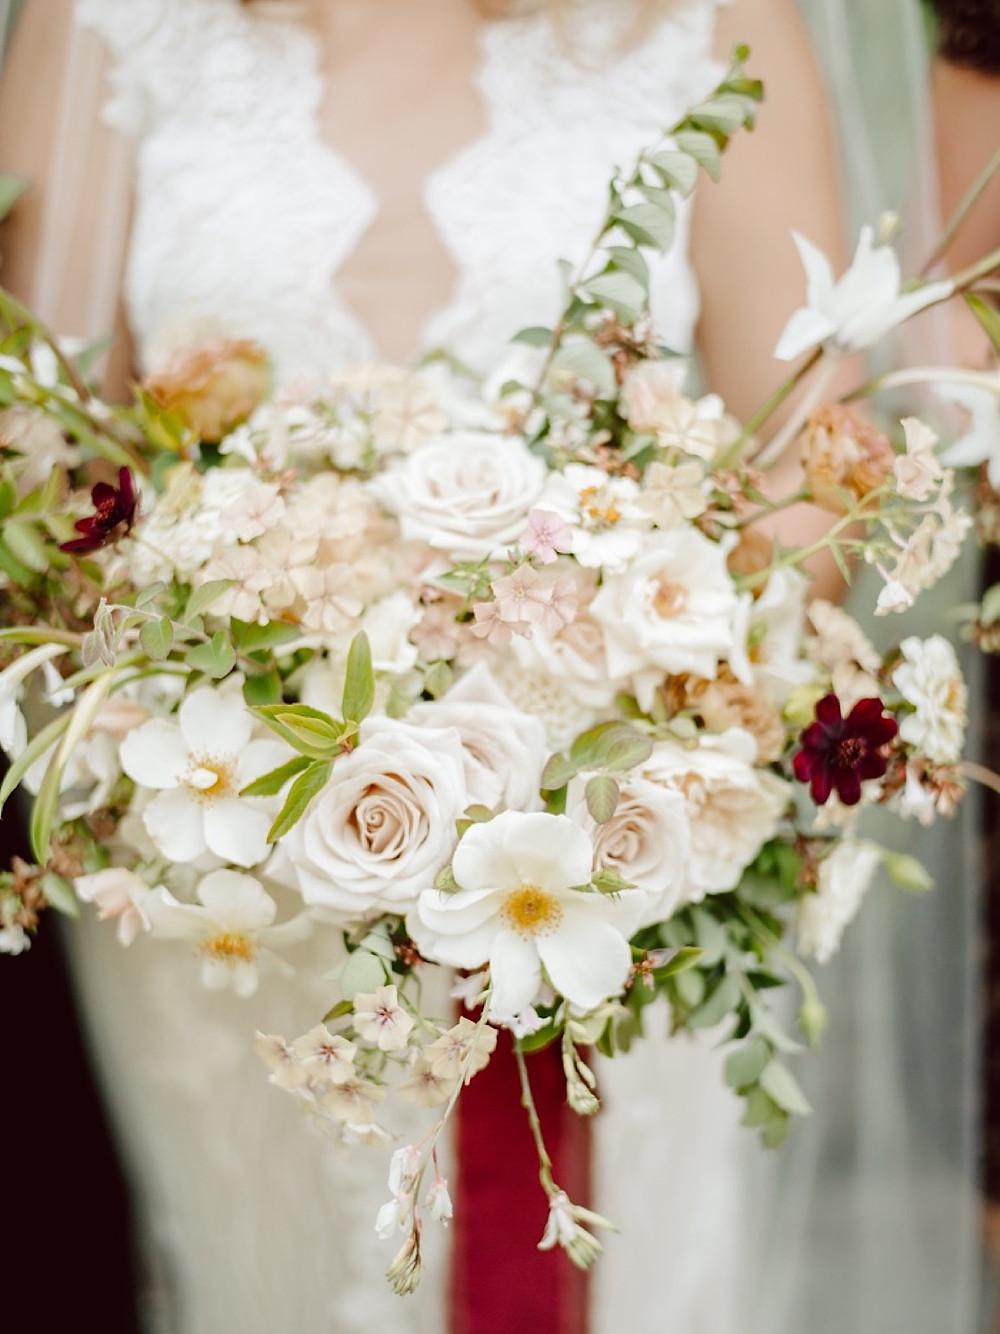 Garden inspired bridal bouquet from Seattle Wedding Florist Botanique at a Thornewood Castle Wedding